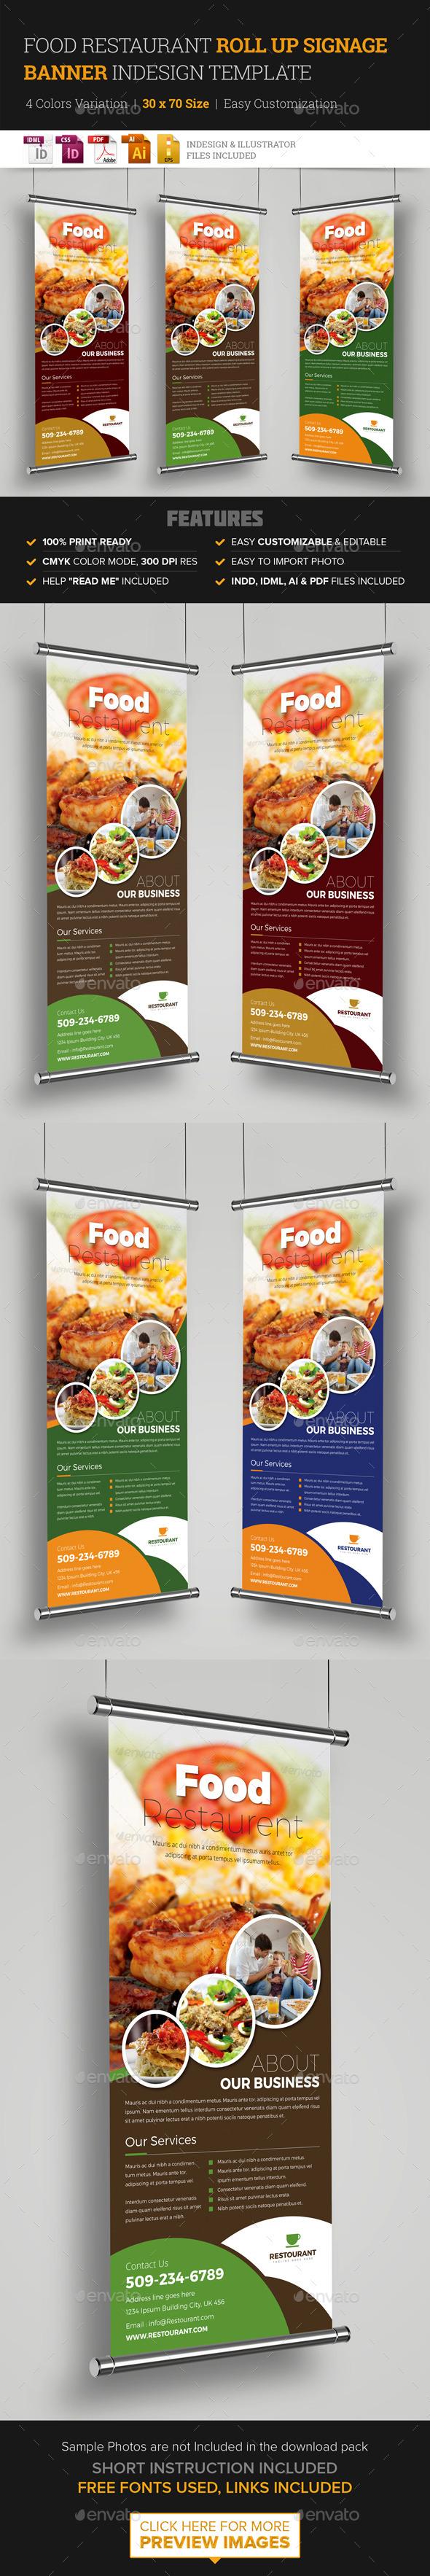 Rolls clipart example go food #12